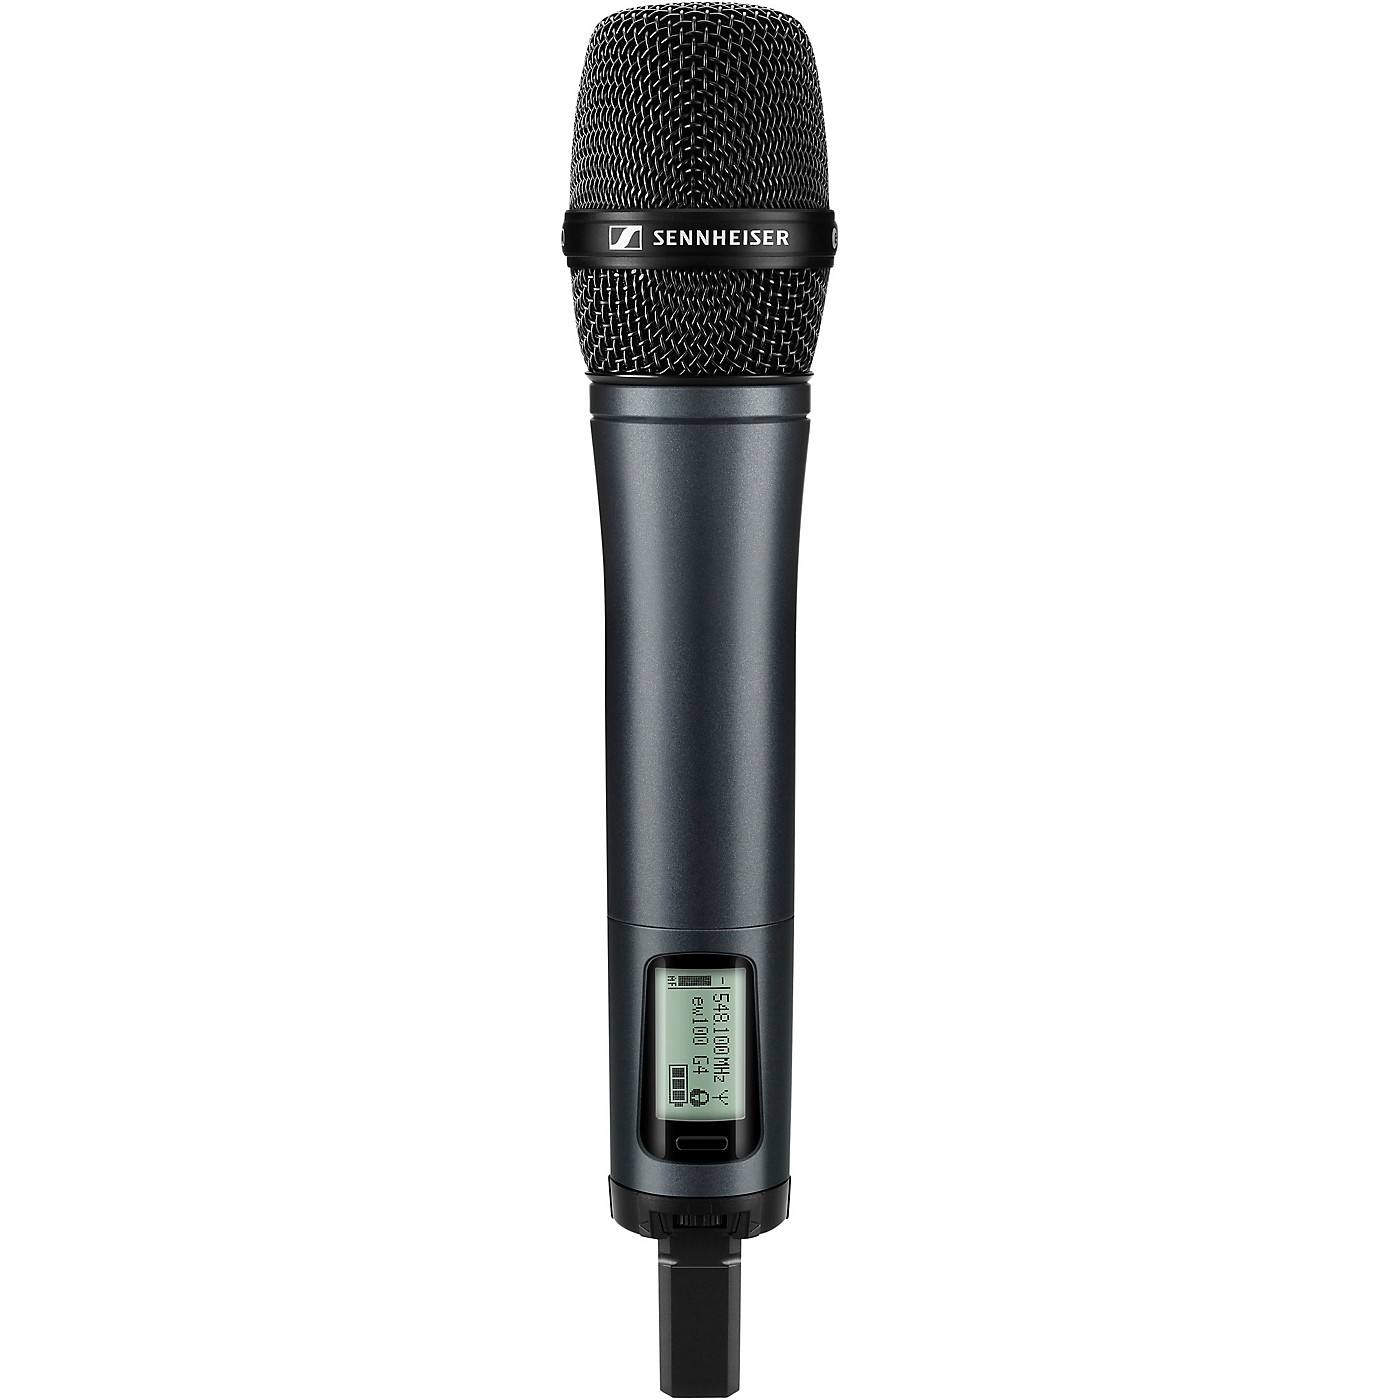 Sennheiser SKM 100 G4 Wireless Handheld Microphone Transmitter, No Capsule thumbnail